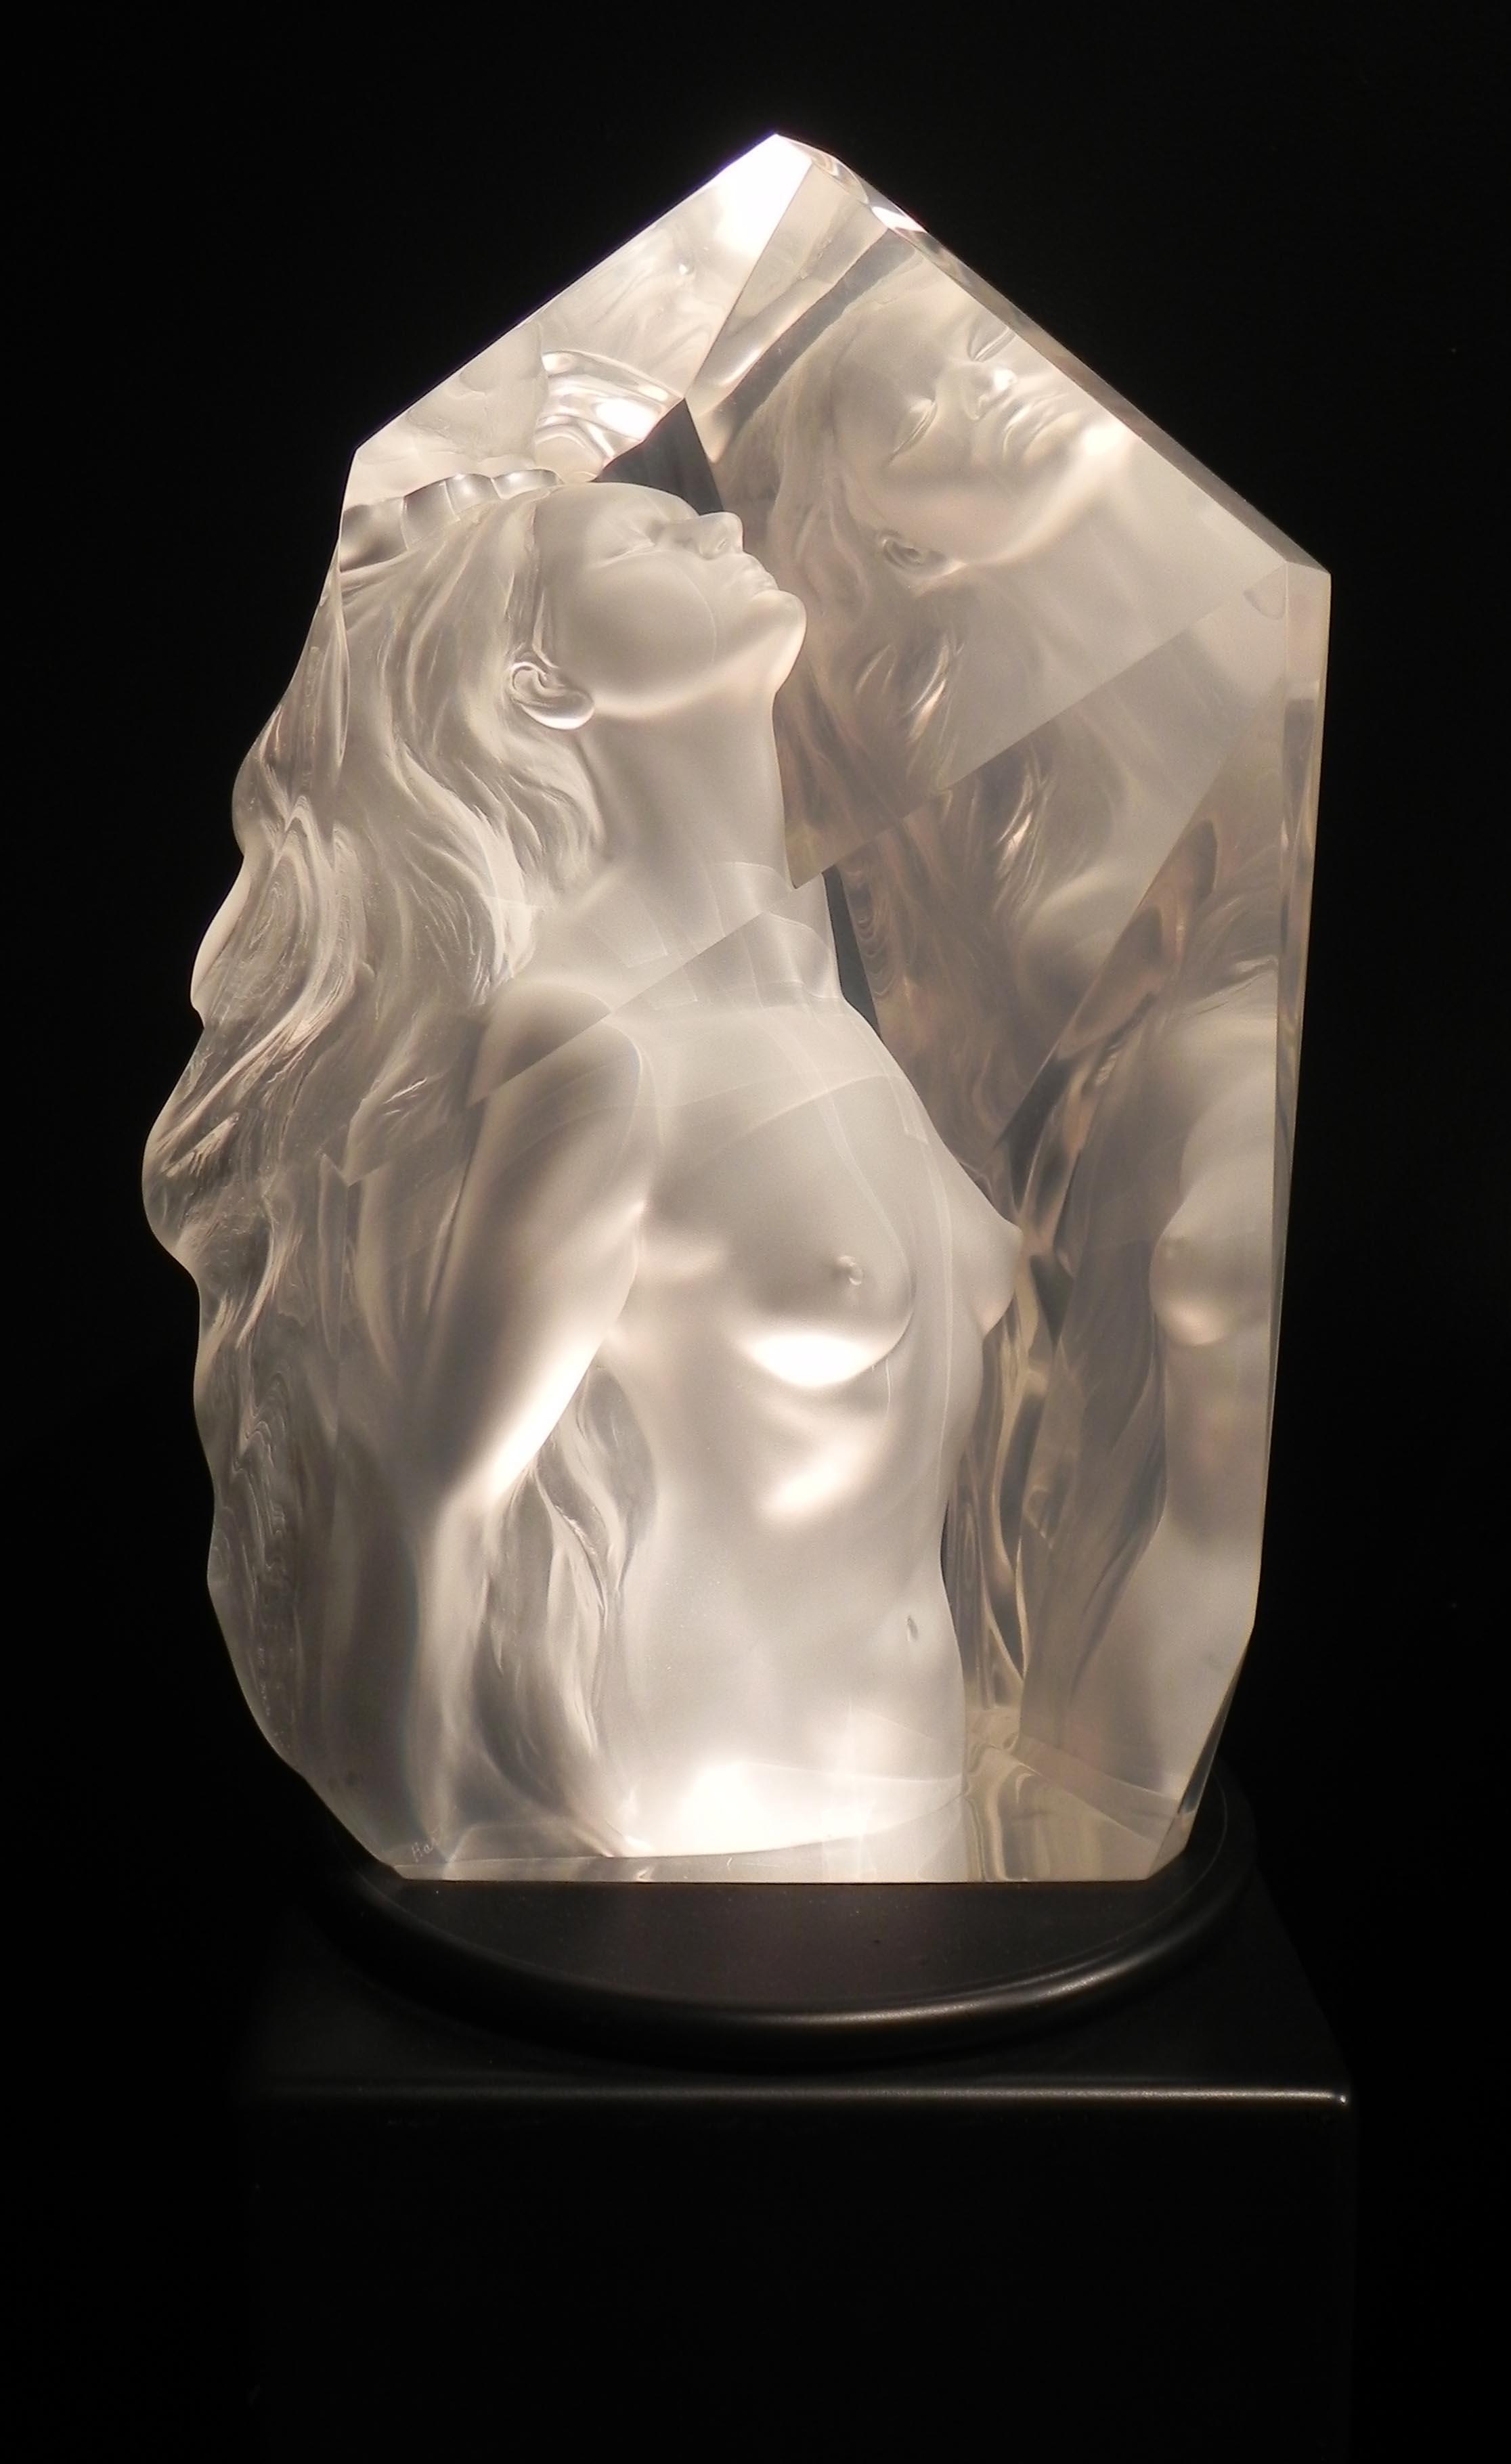 """Exaltation"", Frederick Hart, Lucite Sculpture, Figurative Woman"